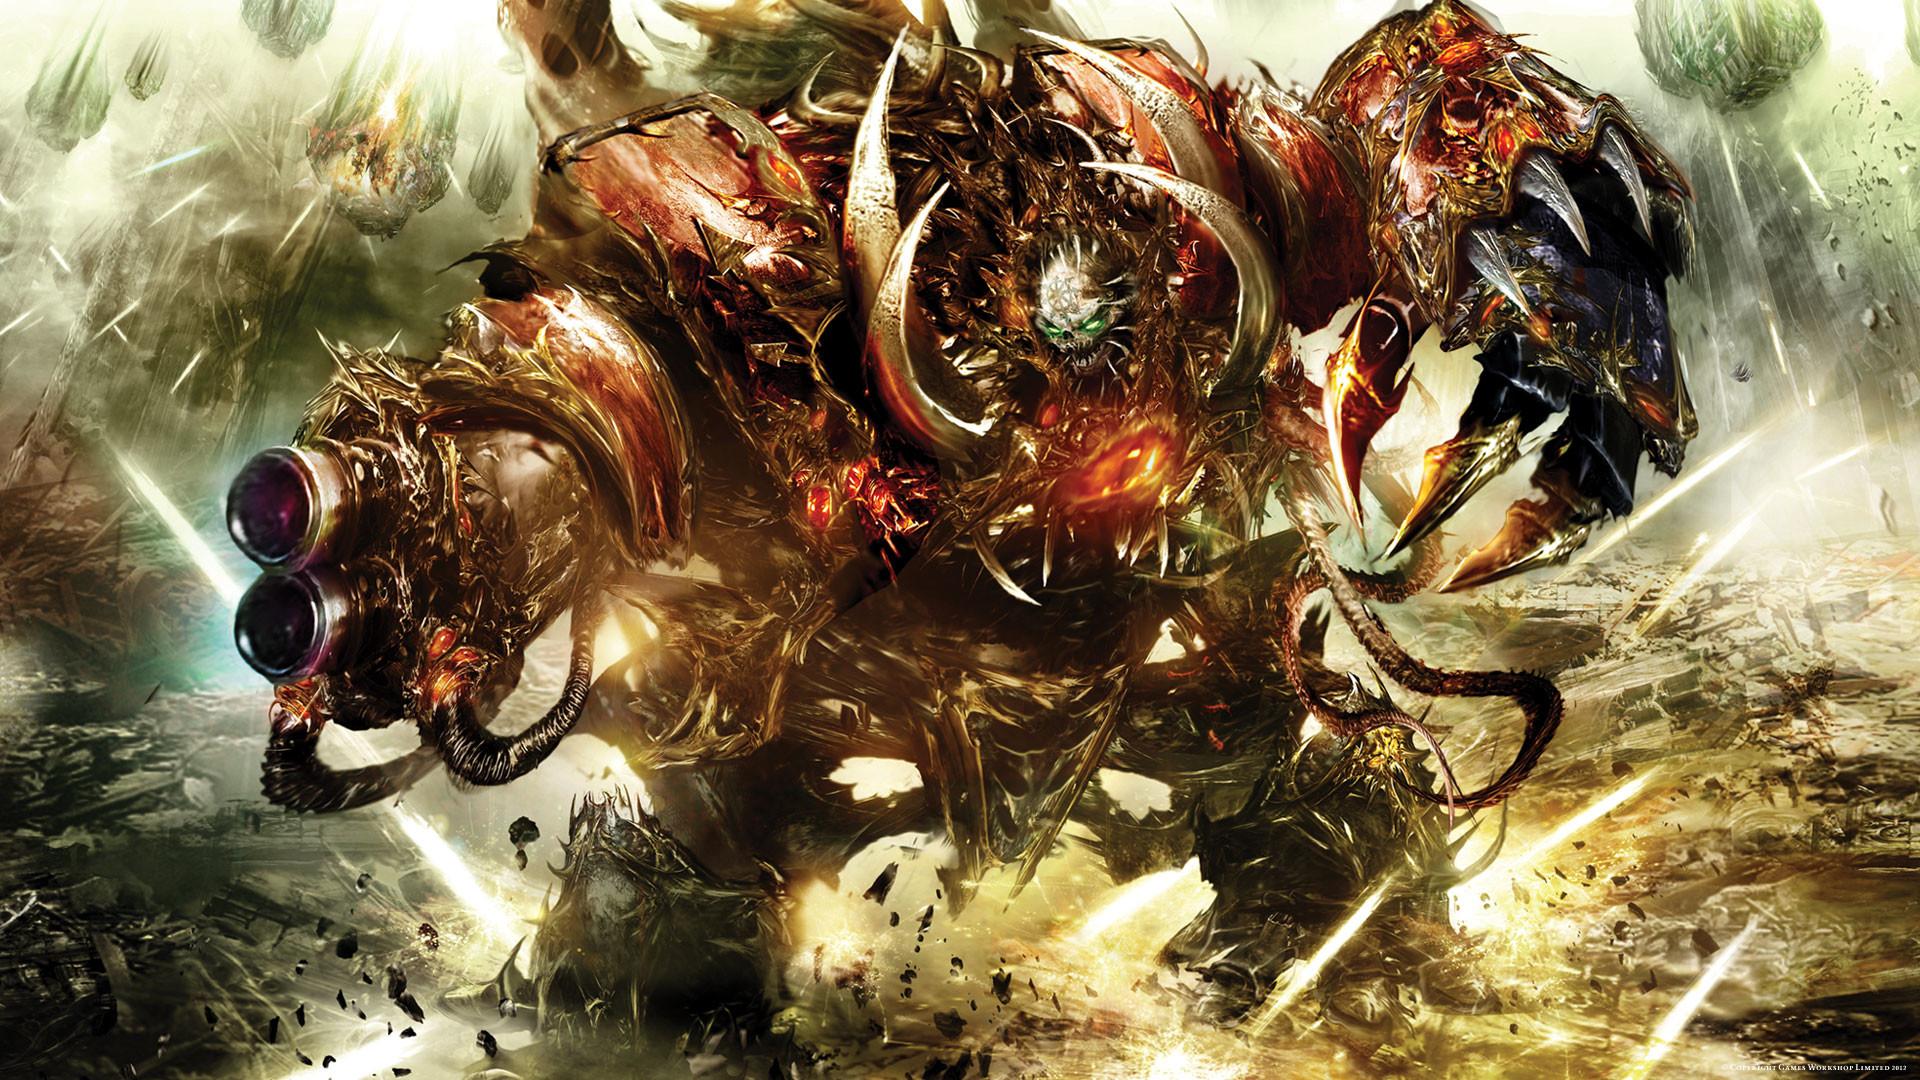 Warhammer 40k Computer Wallpapers, Desktop Backgrounds | .